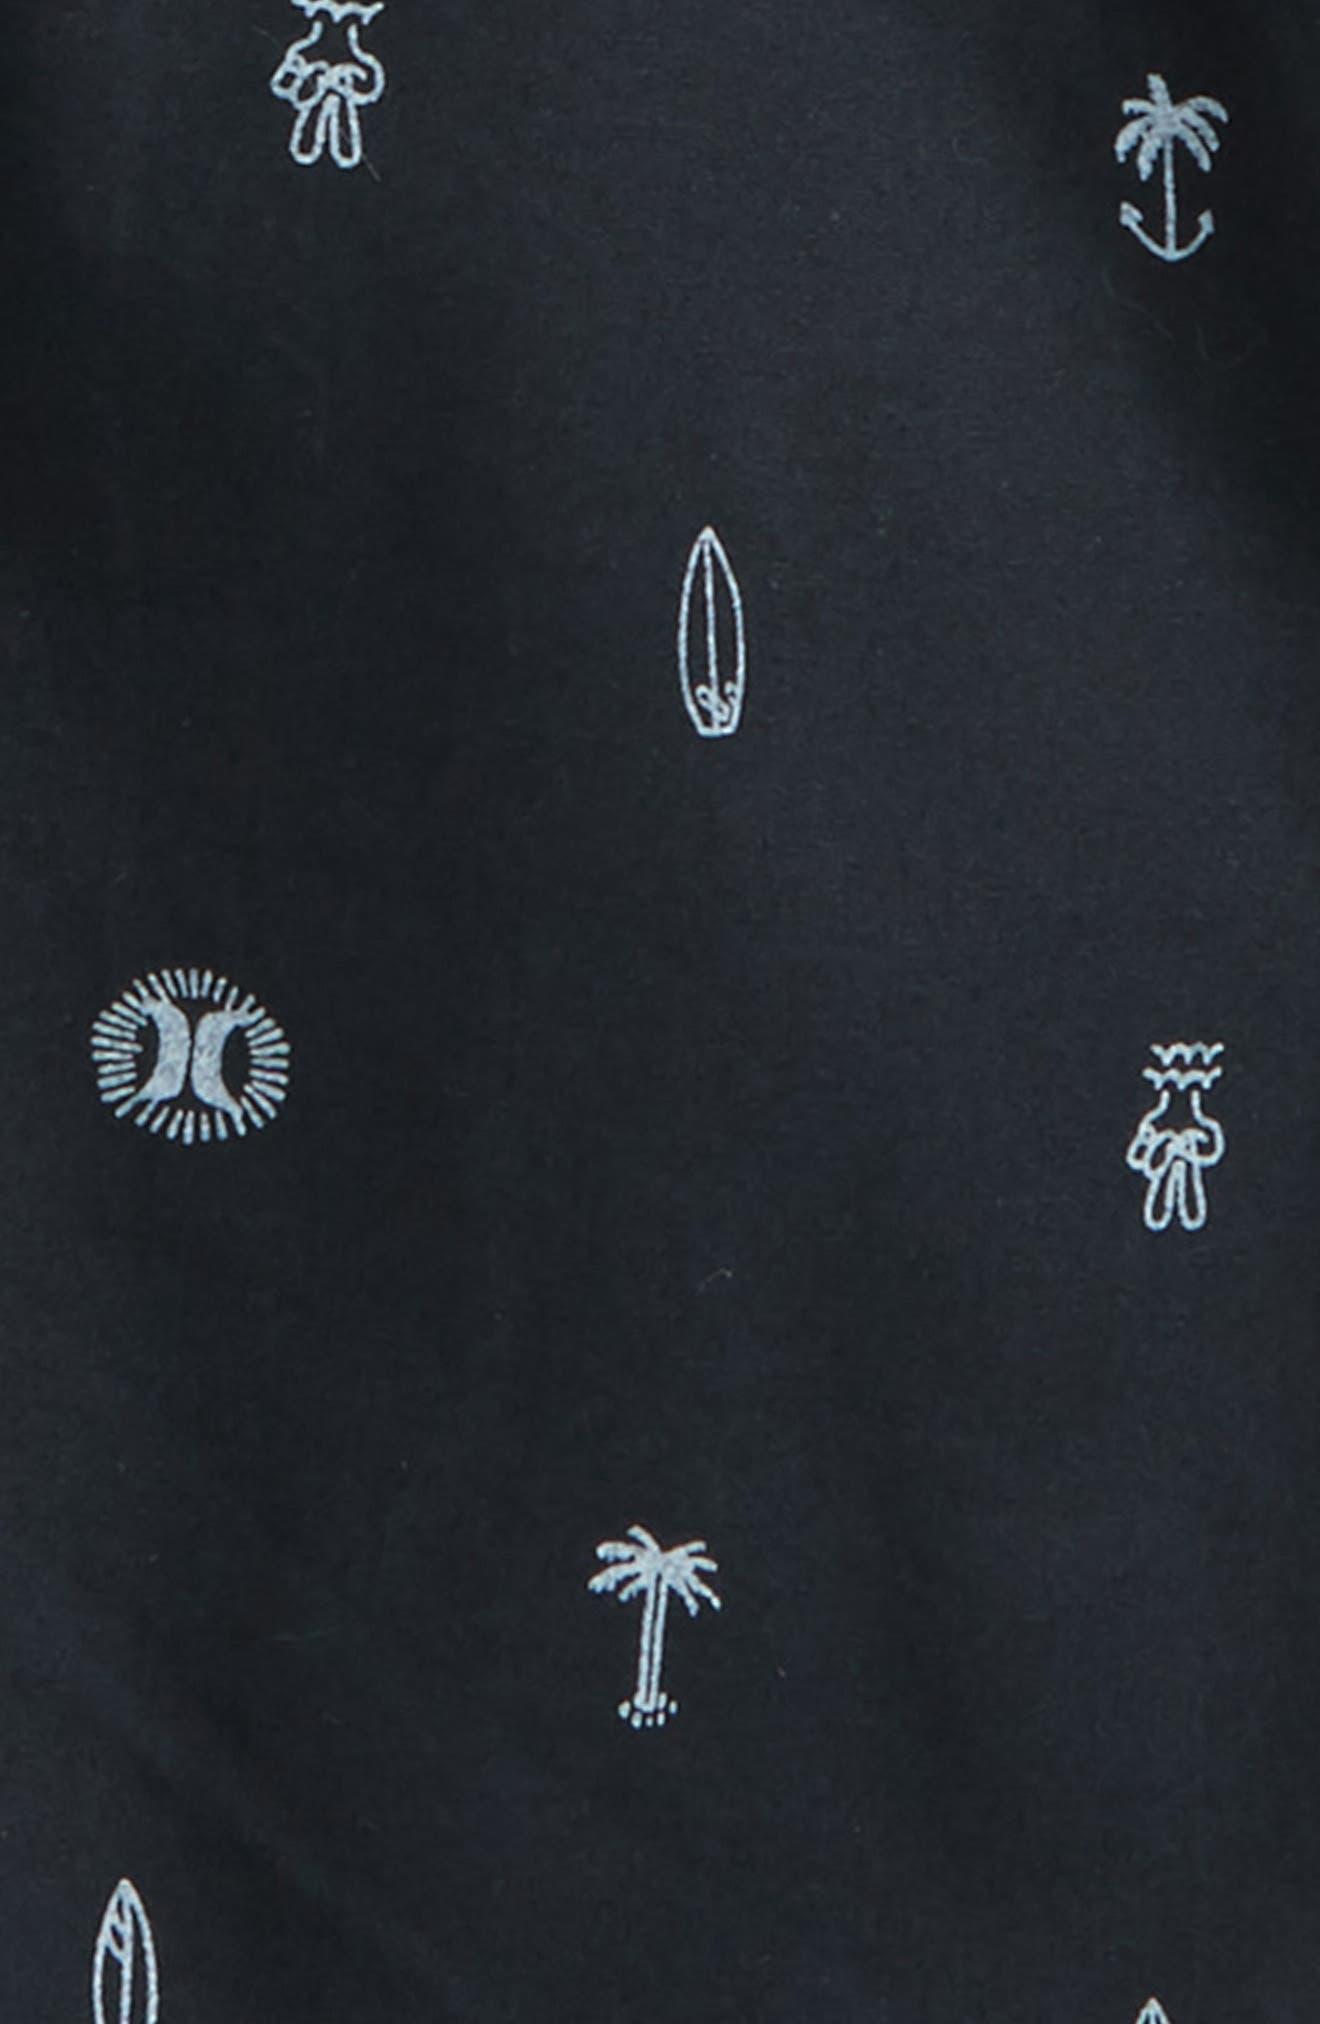 Print Pull-On Shorts,                             Alternate thumbnail 2, color,                             001